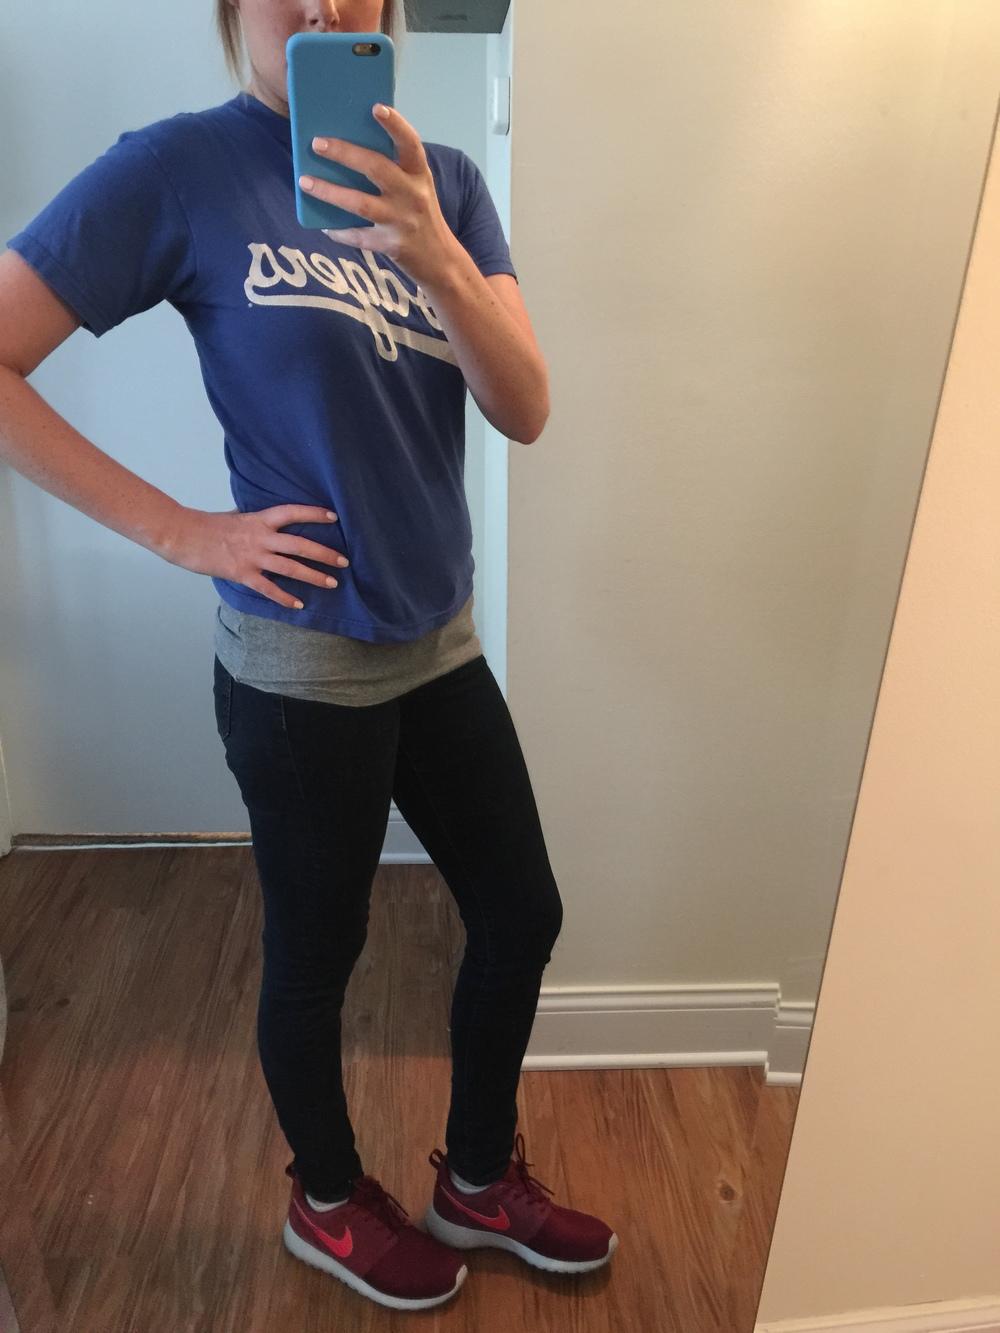 Shirt: GoodwillJeans: KUT, Mia Toothpick Skinny-Nordstorm, Shoes: Nike, Roshe One